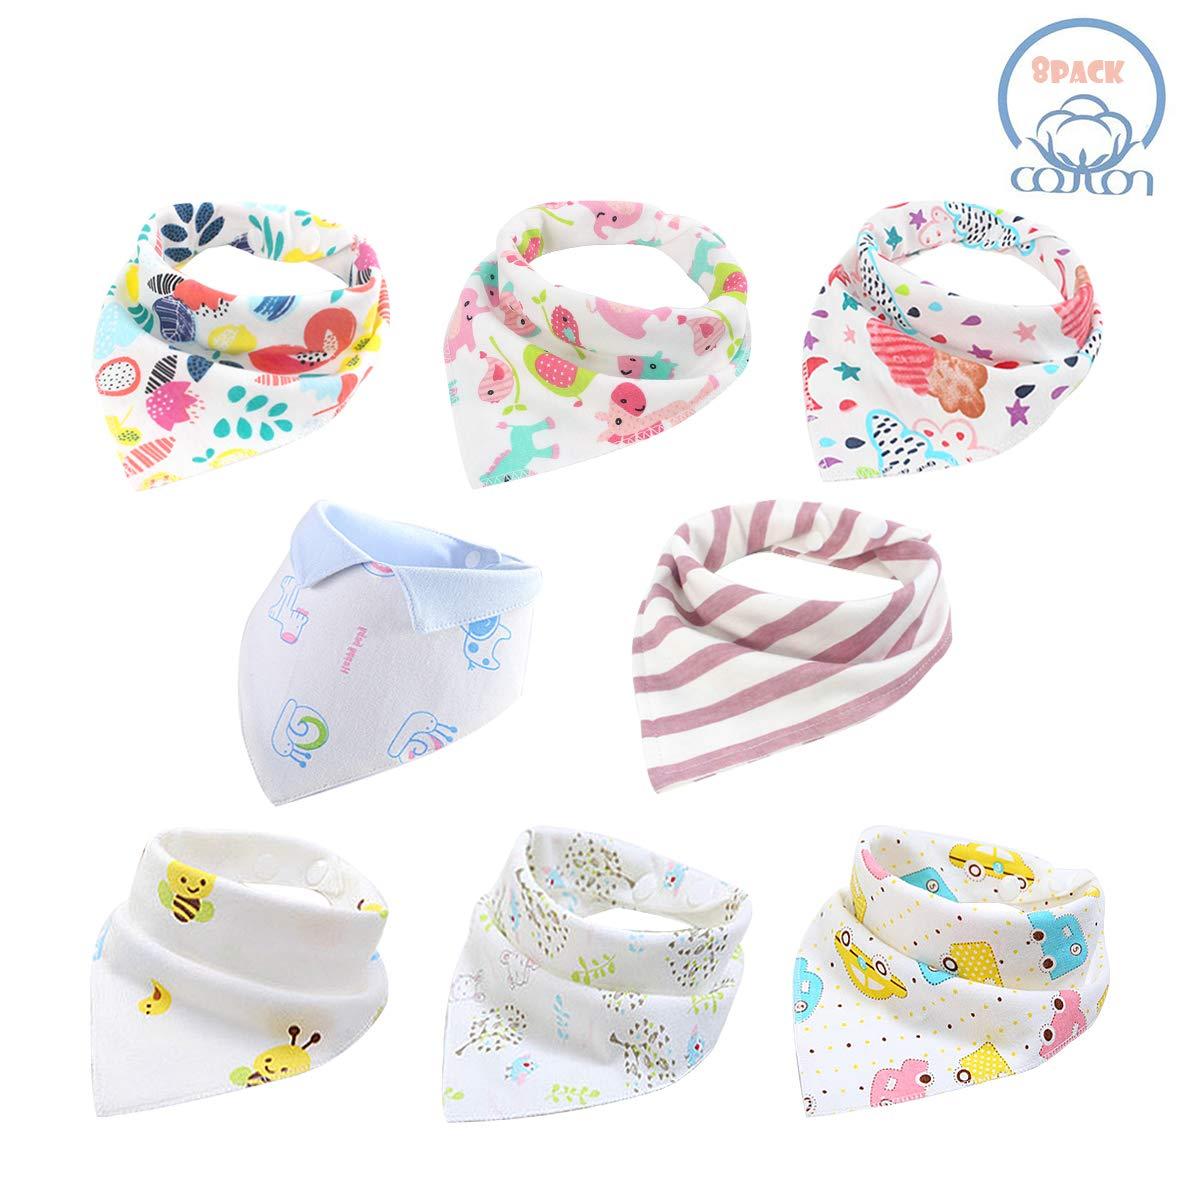 Baby Dribble Bib - Bandana Dribble Bibs Boys, Bandana Drool Bibs for Toddlers, Super Absorbent Soft Cute Bibs Girls, Ideal Baby Gift with 2 Adjustable Snaps - 10 PCS (Boy-Thin-A)